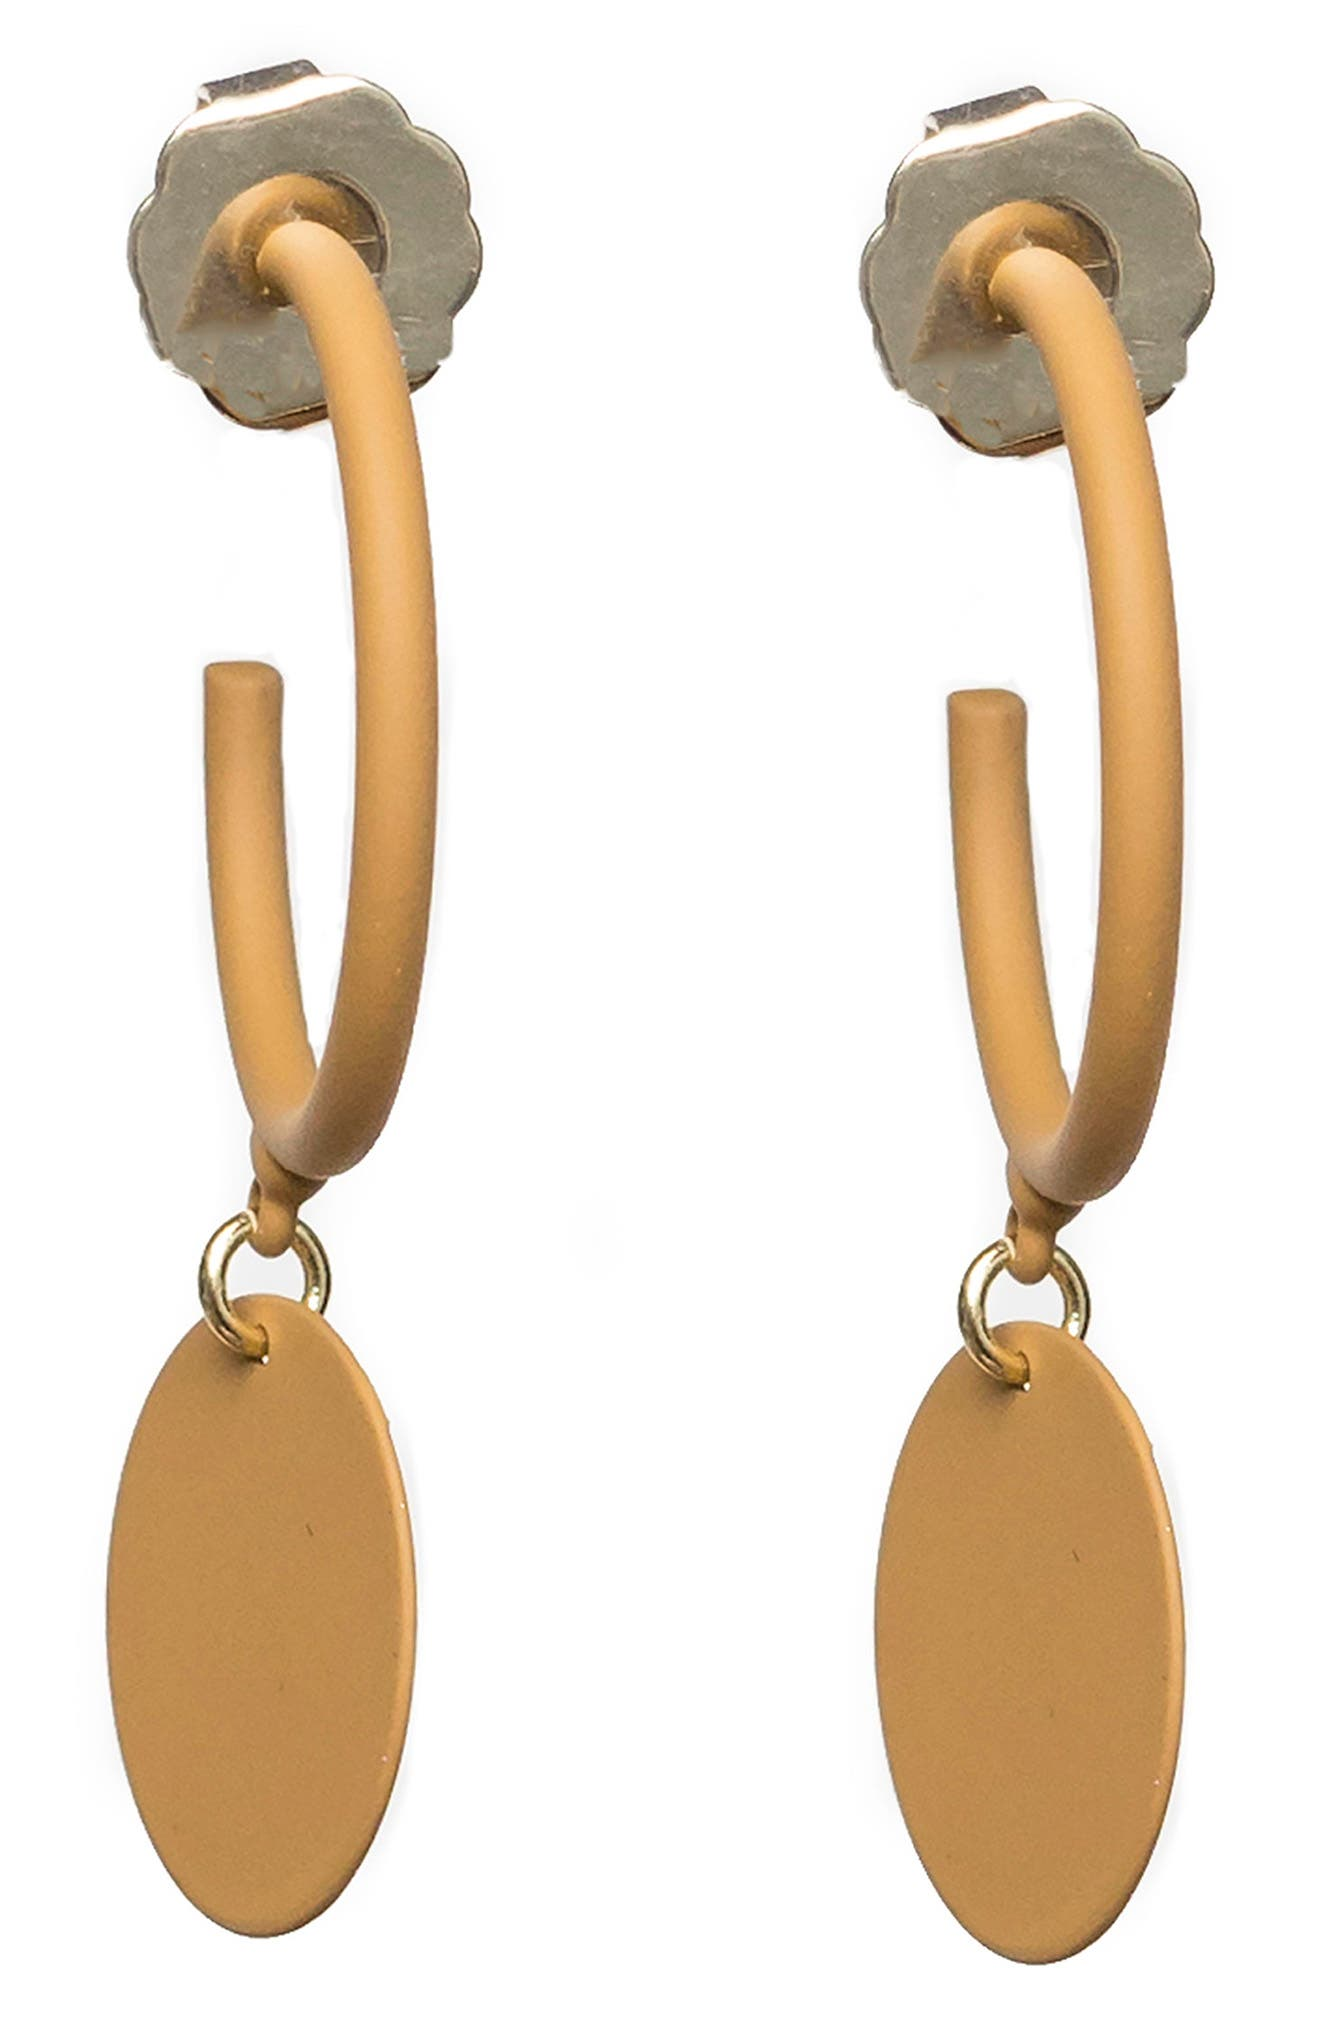 Hanging Medallion Hoop Earrings,                             Main thumbnail 1, color,                             Yellow